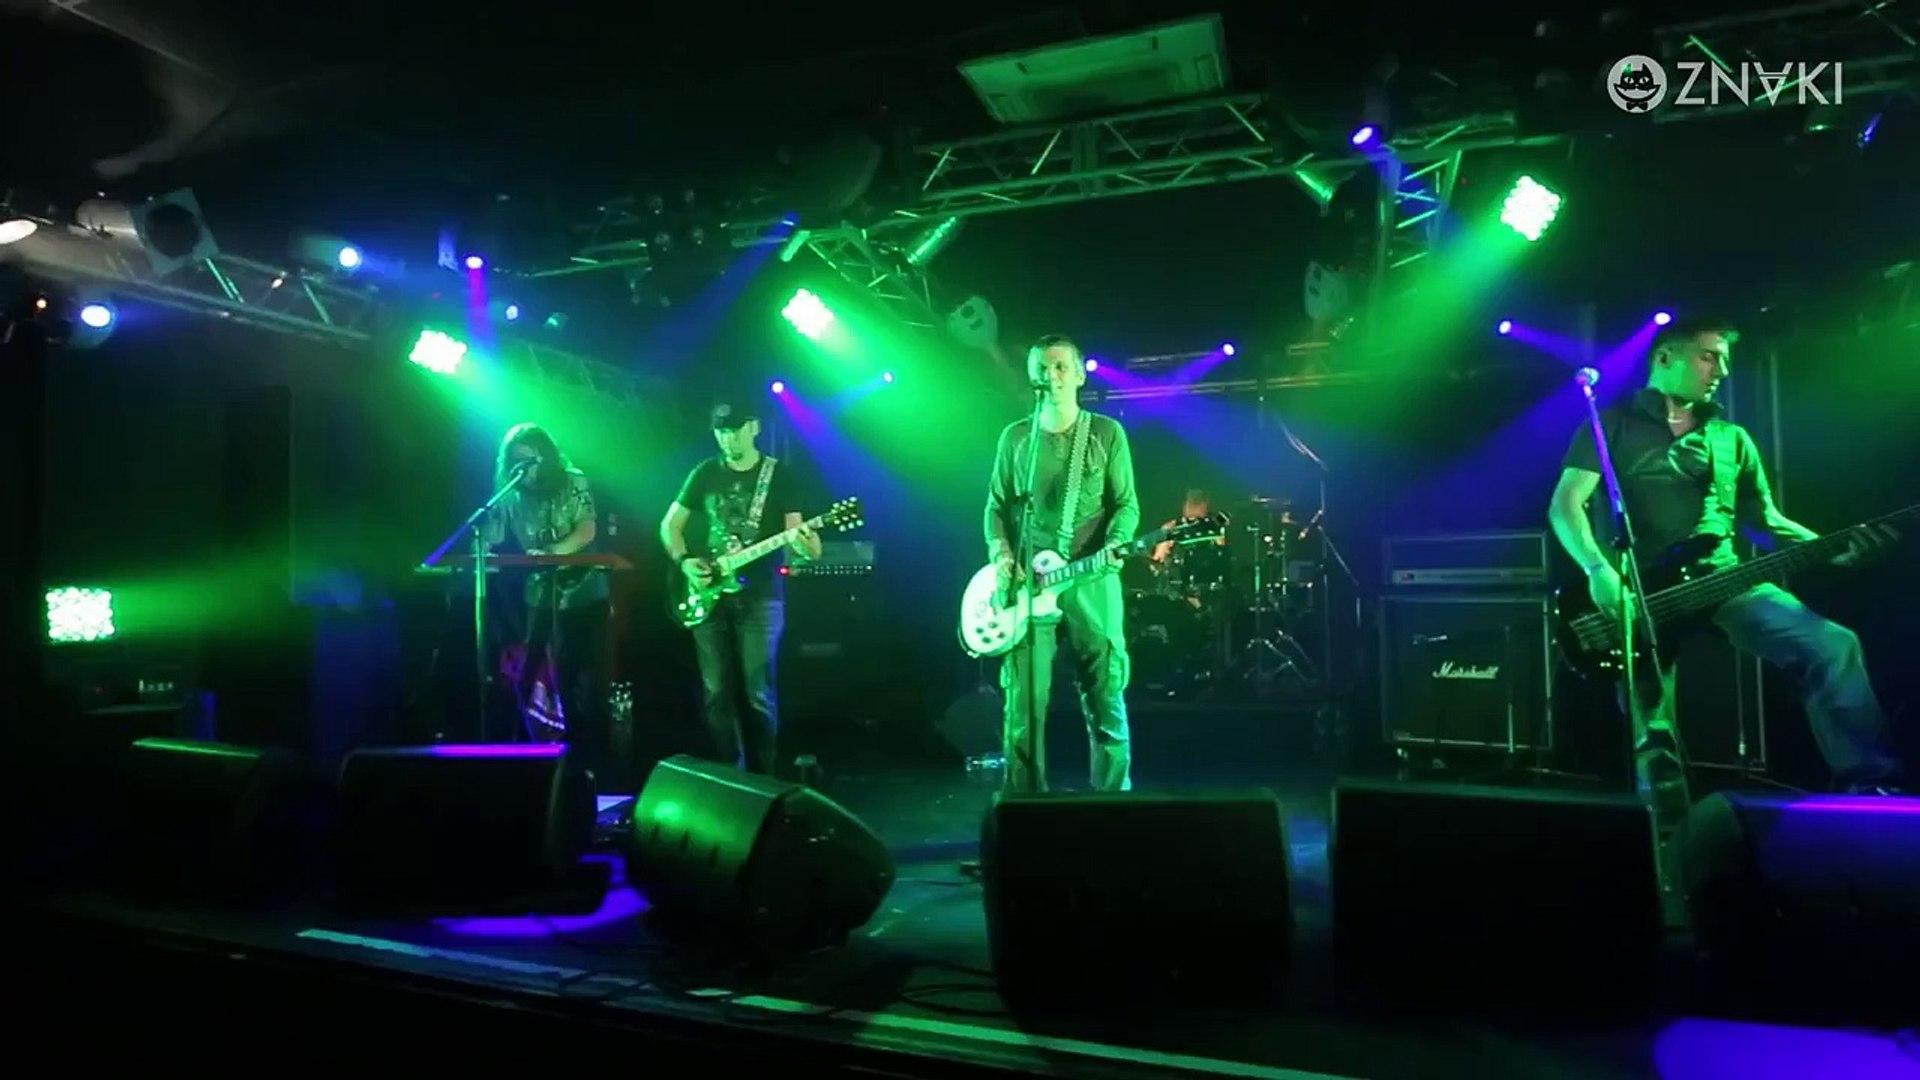 ZNAKI – 15 – Полли – Live – Концерт в клубе «Зал Ожидания» – 5.09.2014